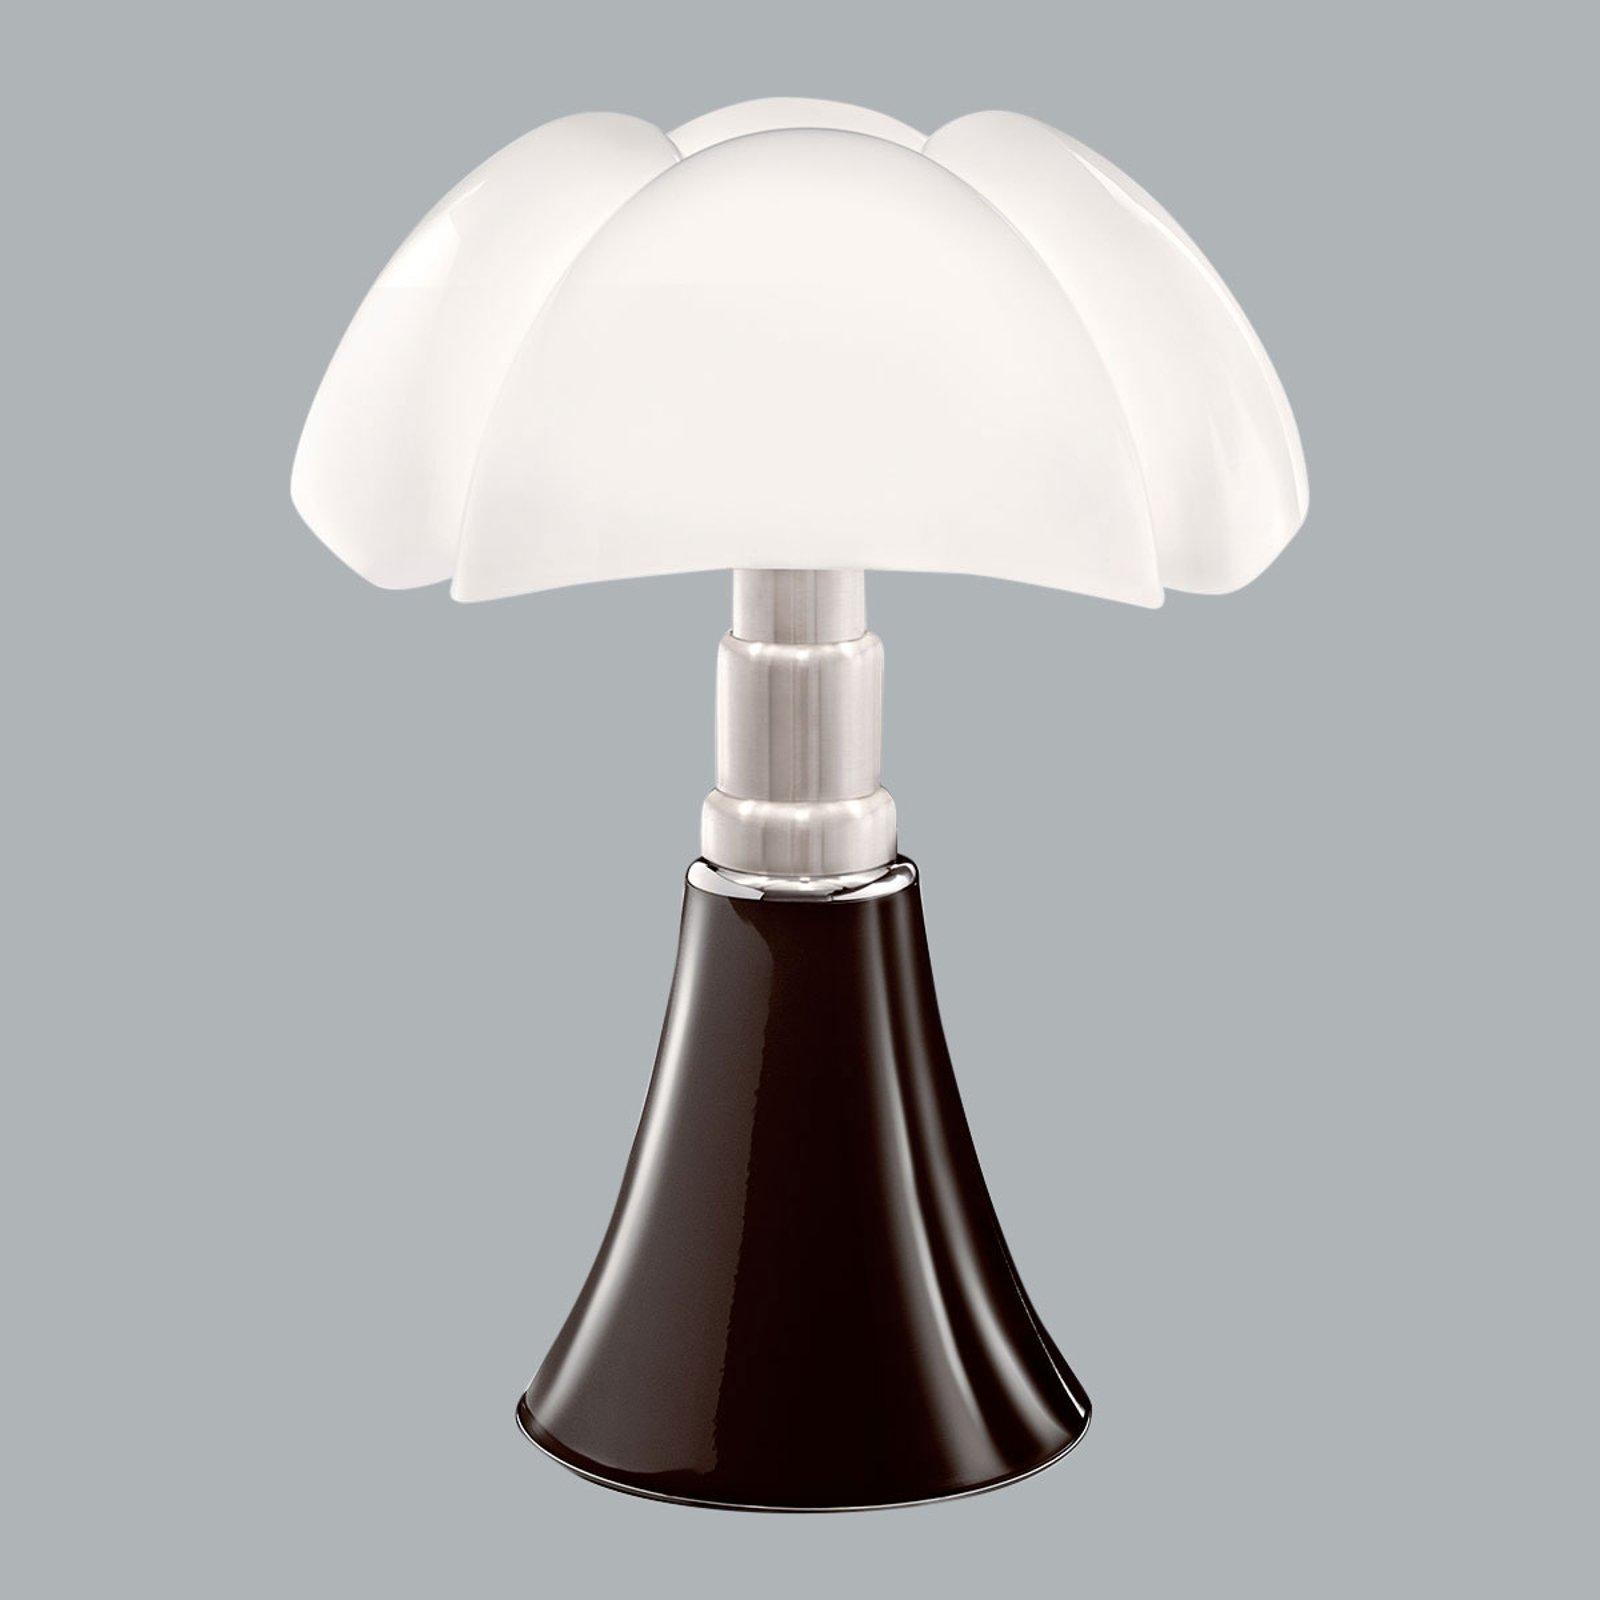 Martinelli Luce Minipipistrello bordlampe brun